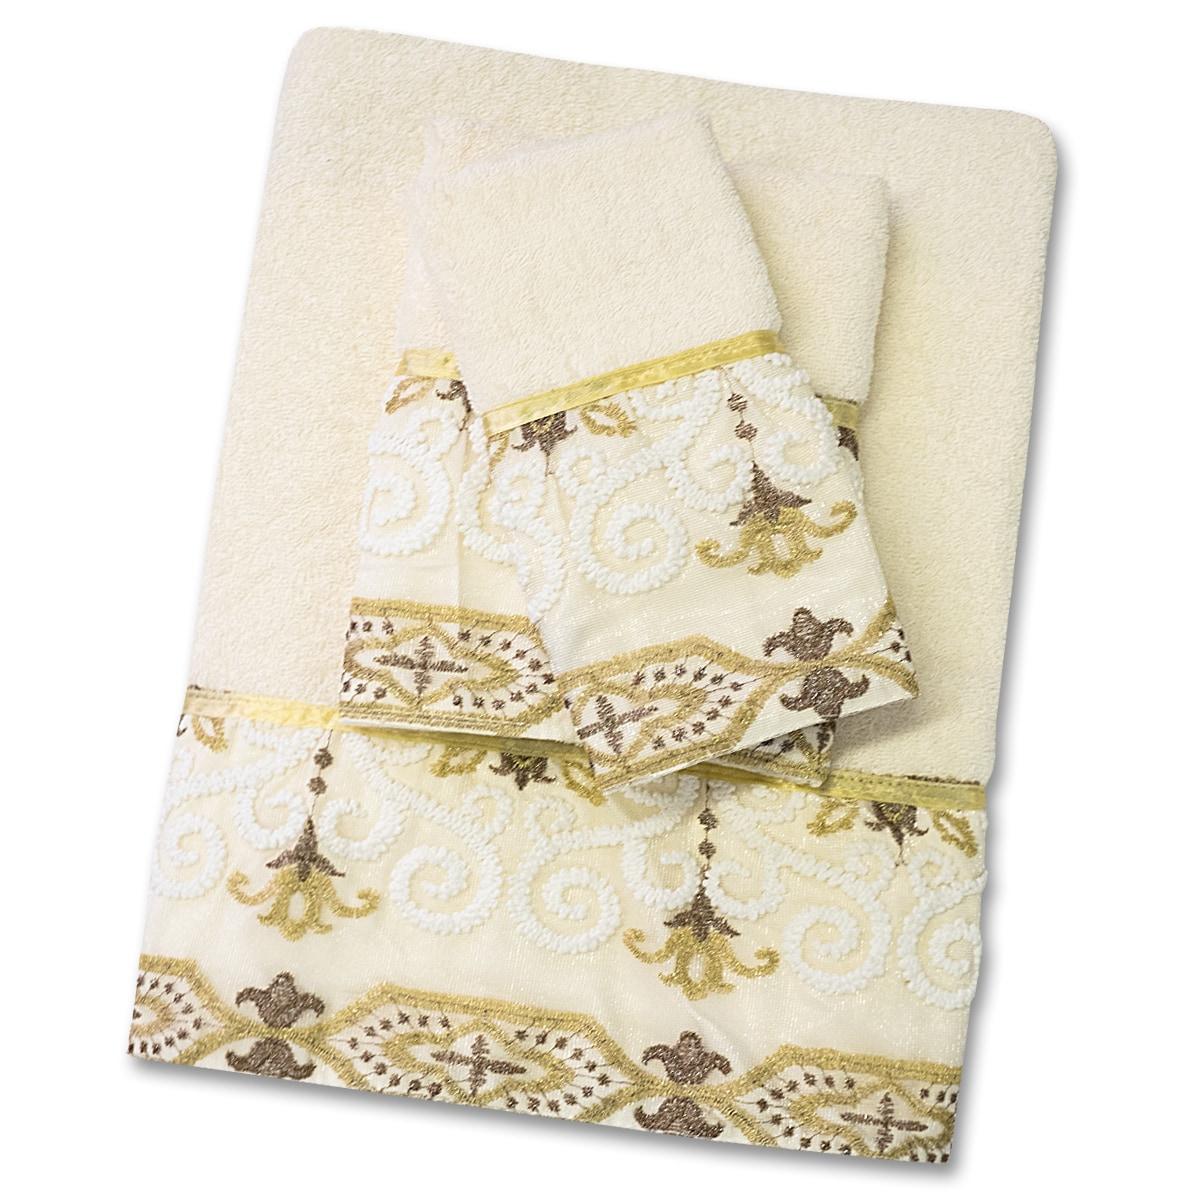 bed bath n more Savoy 3 Piece Towel Set- Gold/Ivory